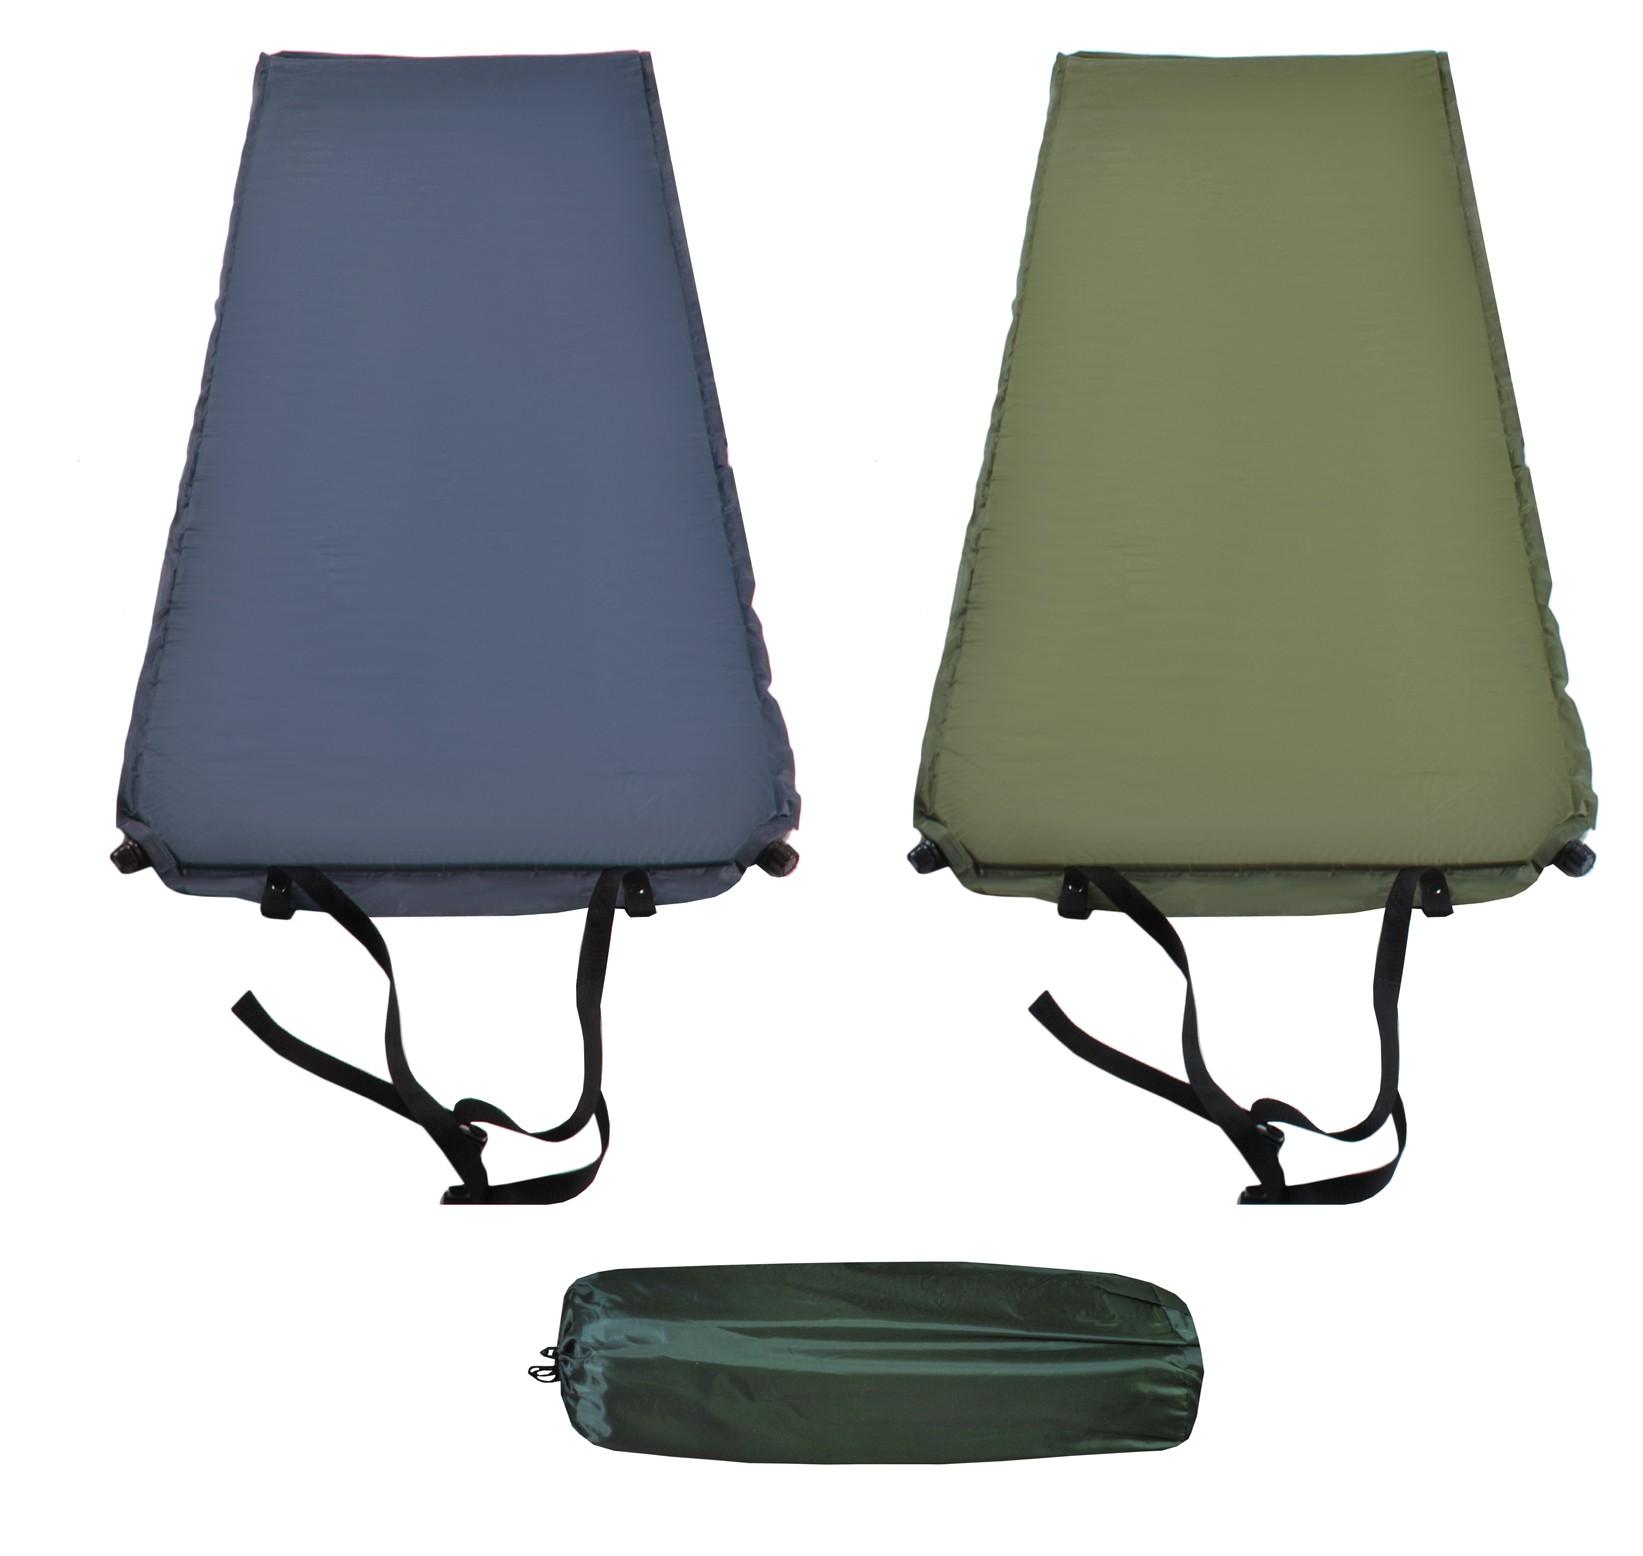 tapis 2 couleurs isolant tapis matelas matelas gonflable tapis thermique neuf 1953 ebay. Black Bedroom Furniture Sets. Home Design Ideas